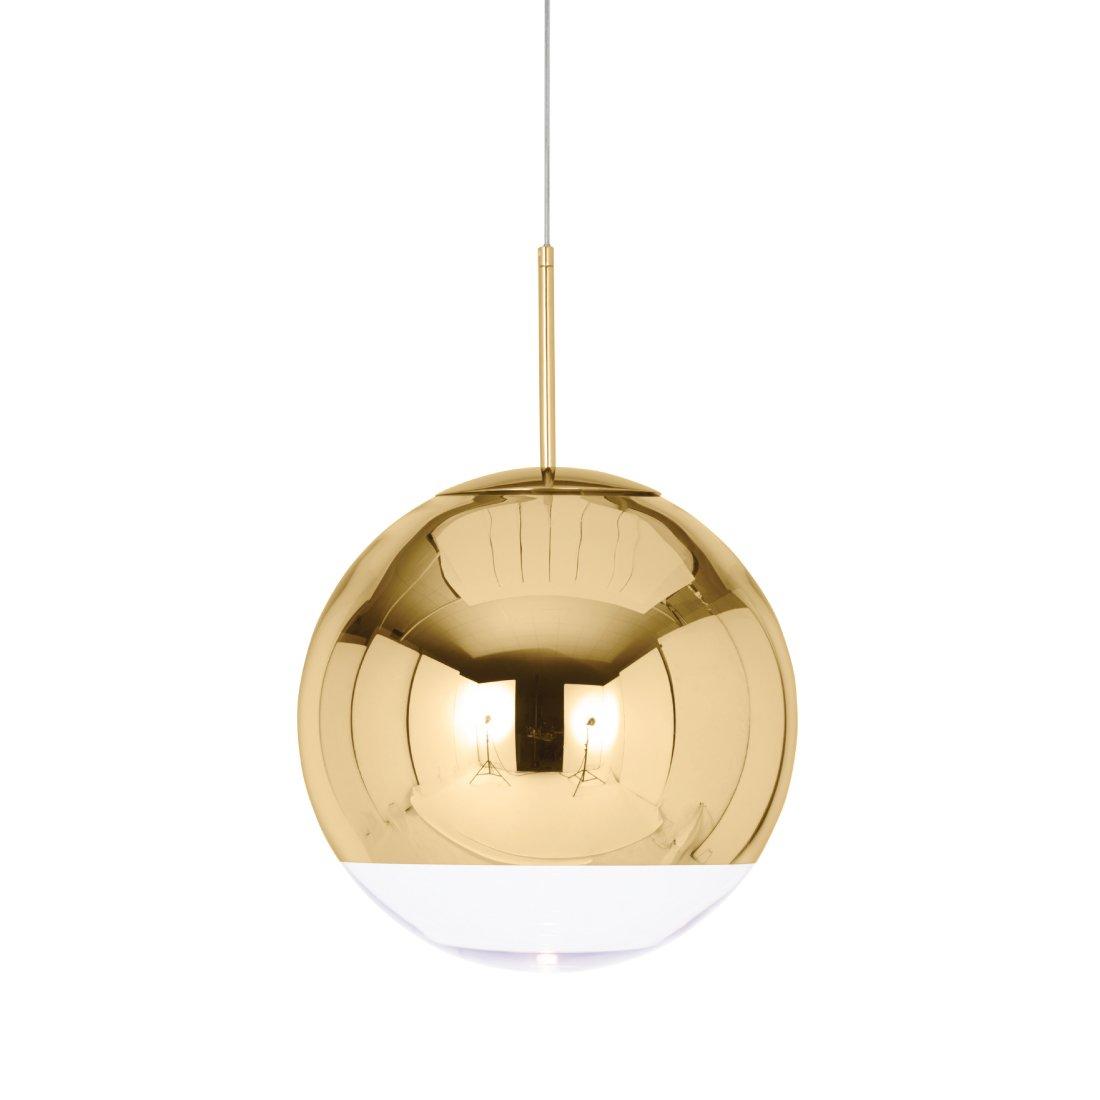 Tom Dixon Mirror Ball Hanglamp Goud � 40 cm